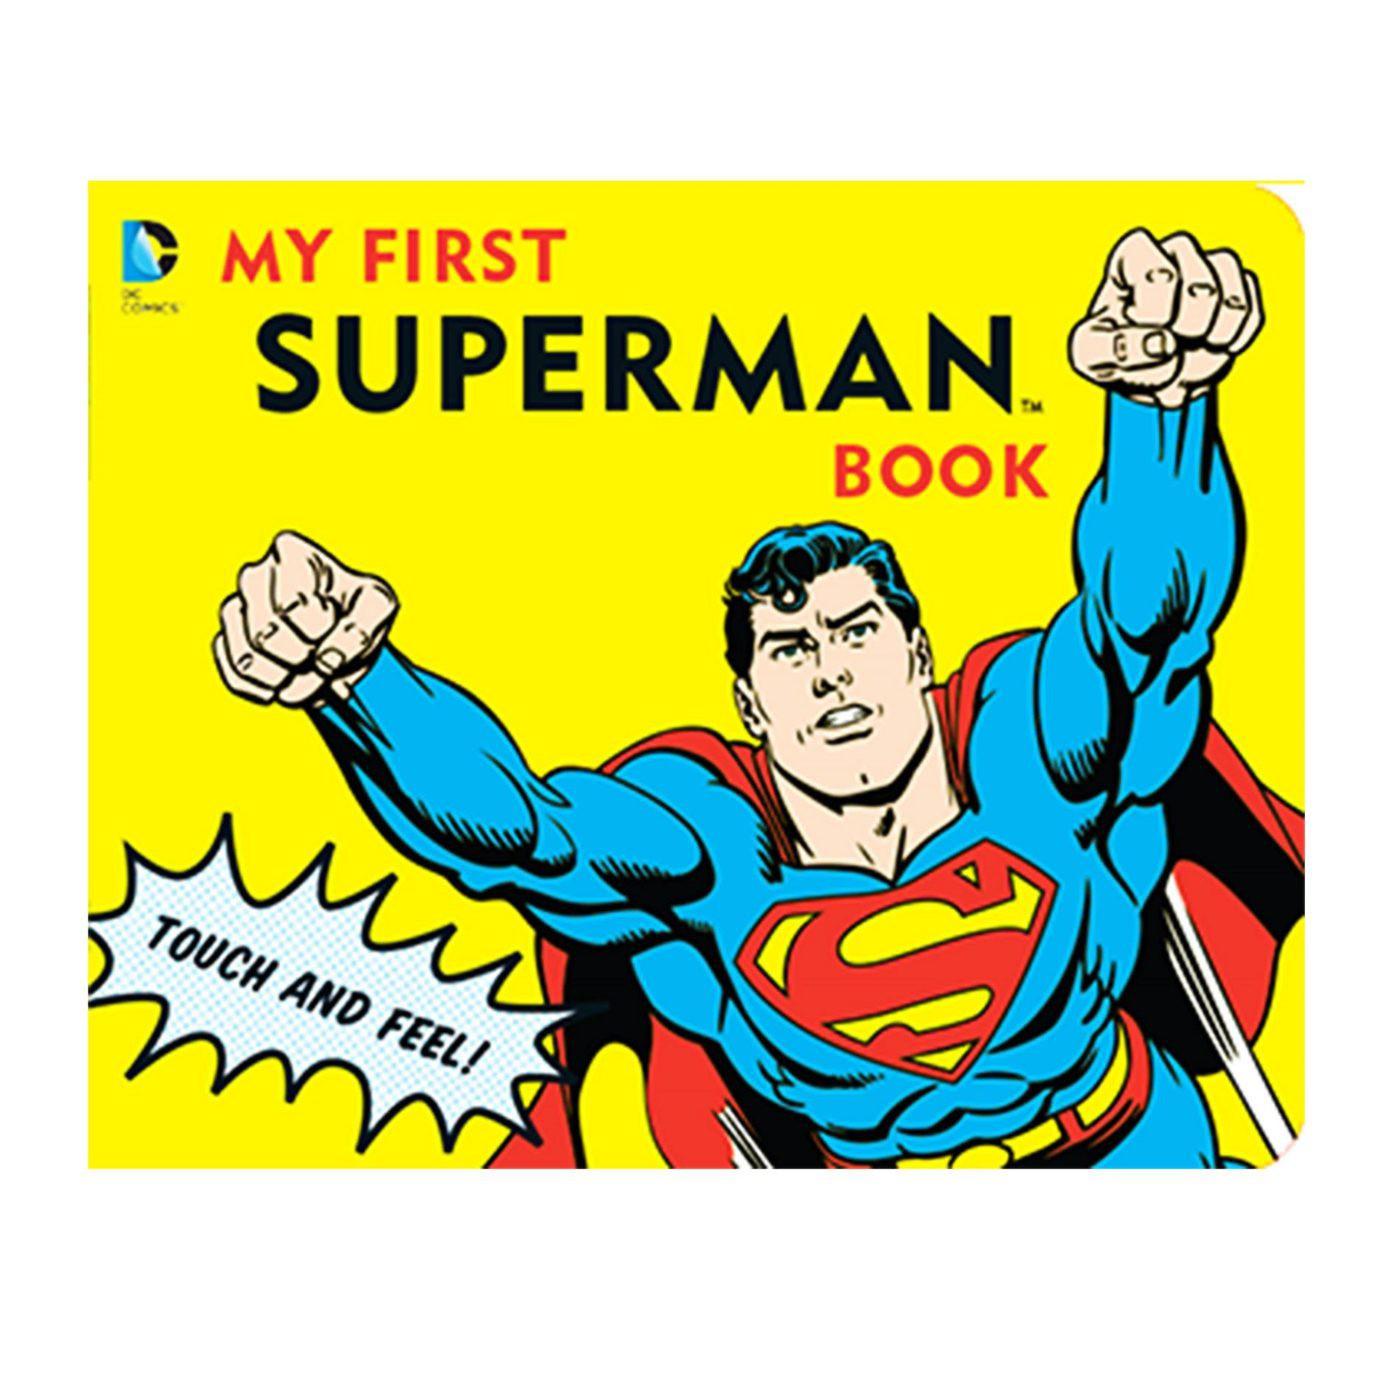 My First Superman Book